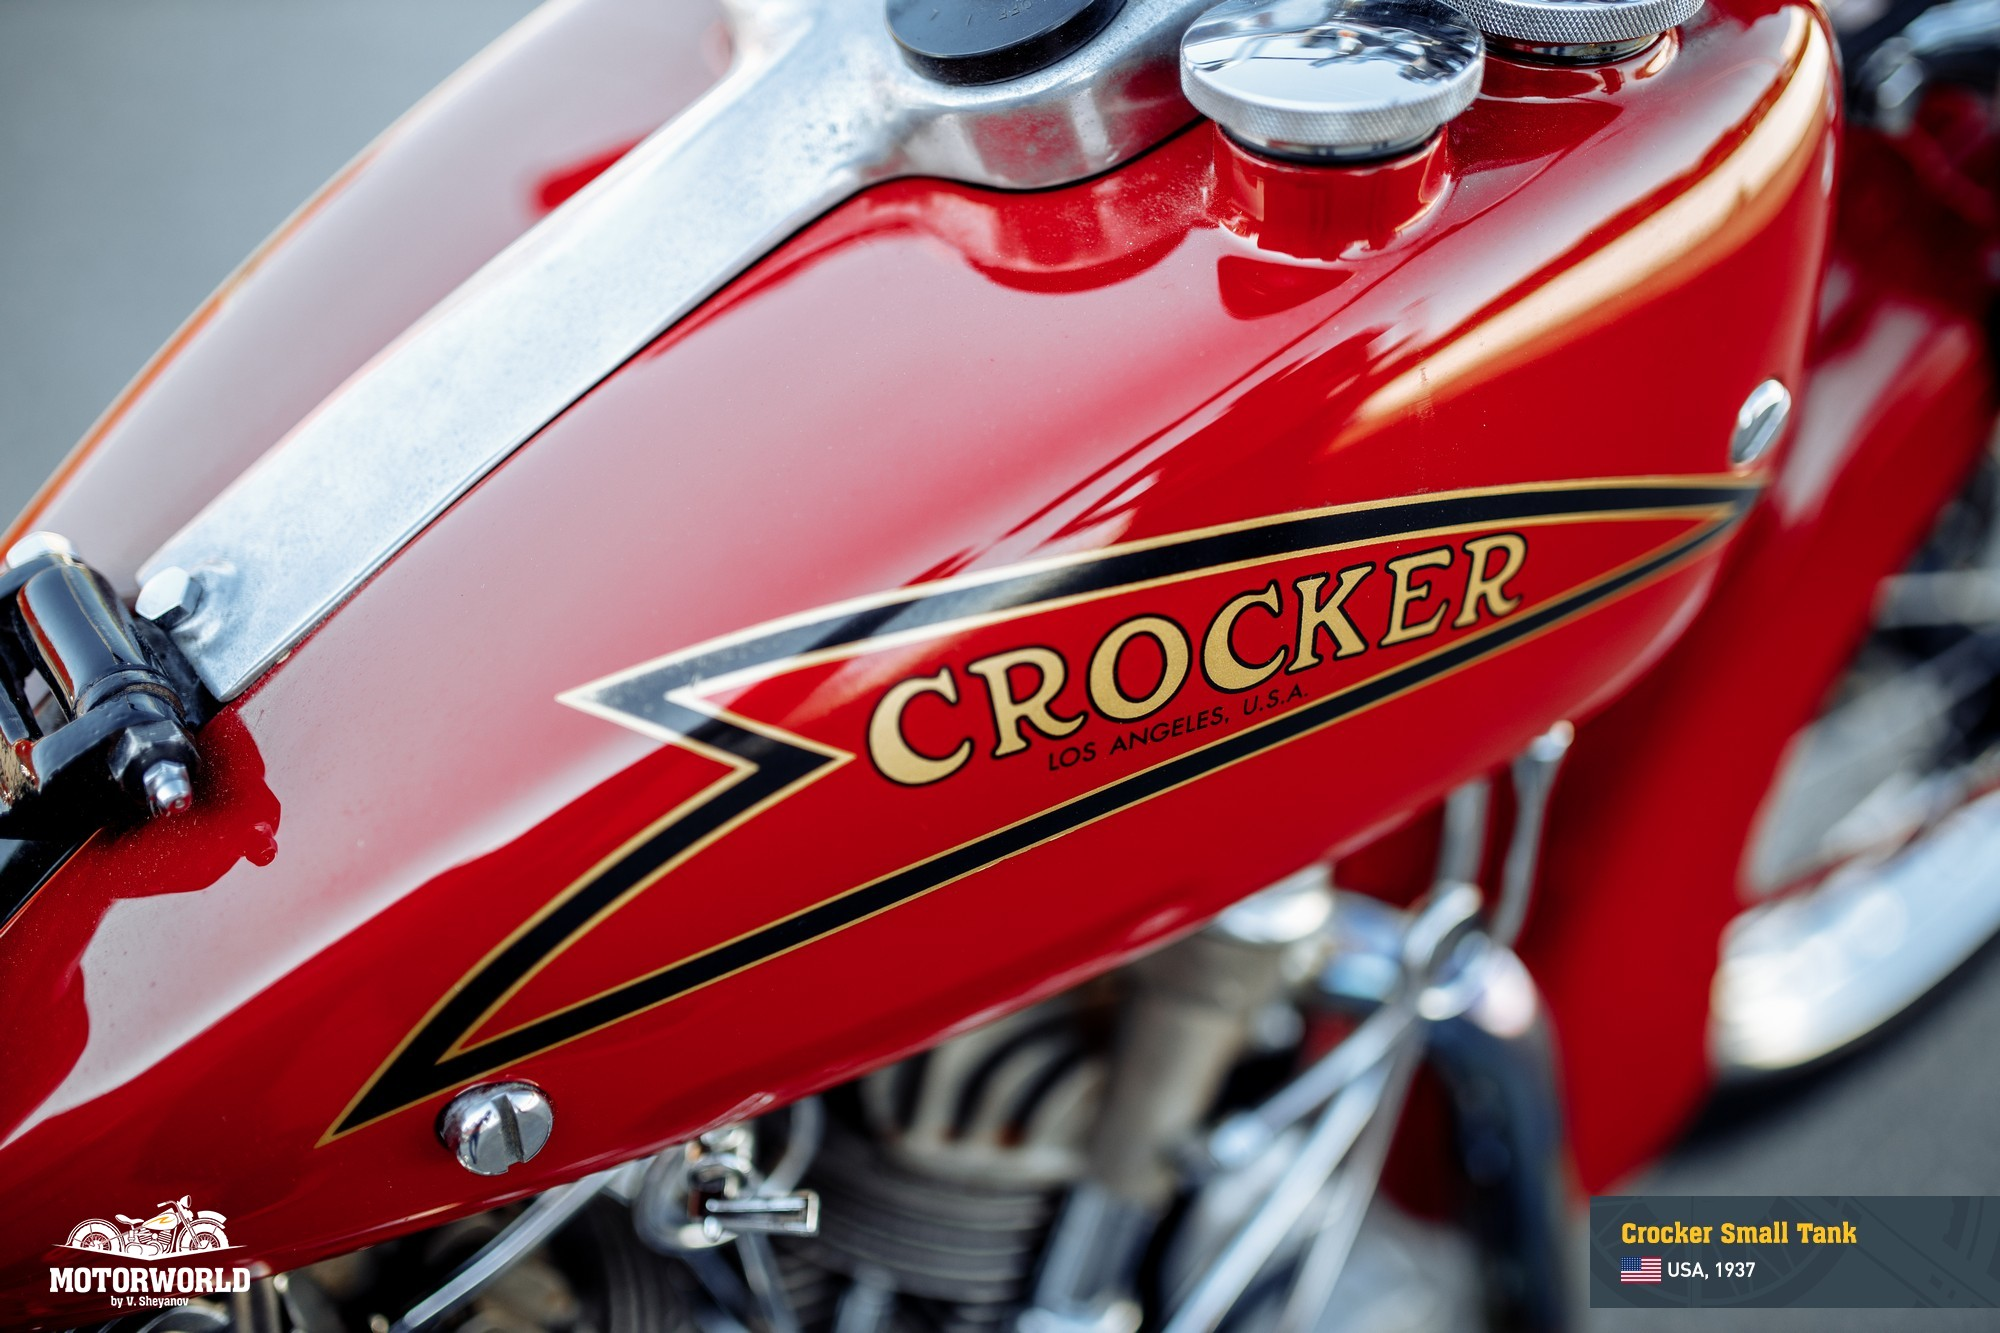 crocker-small-tank-web-eng-35